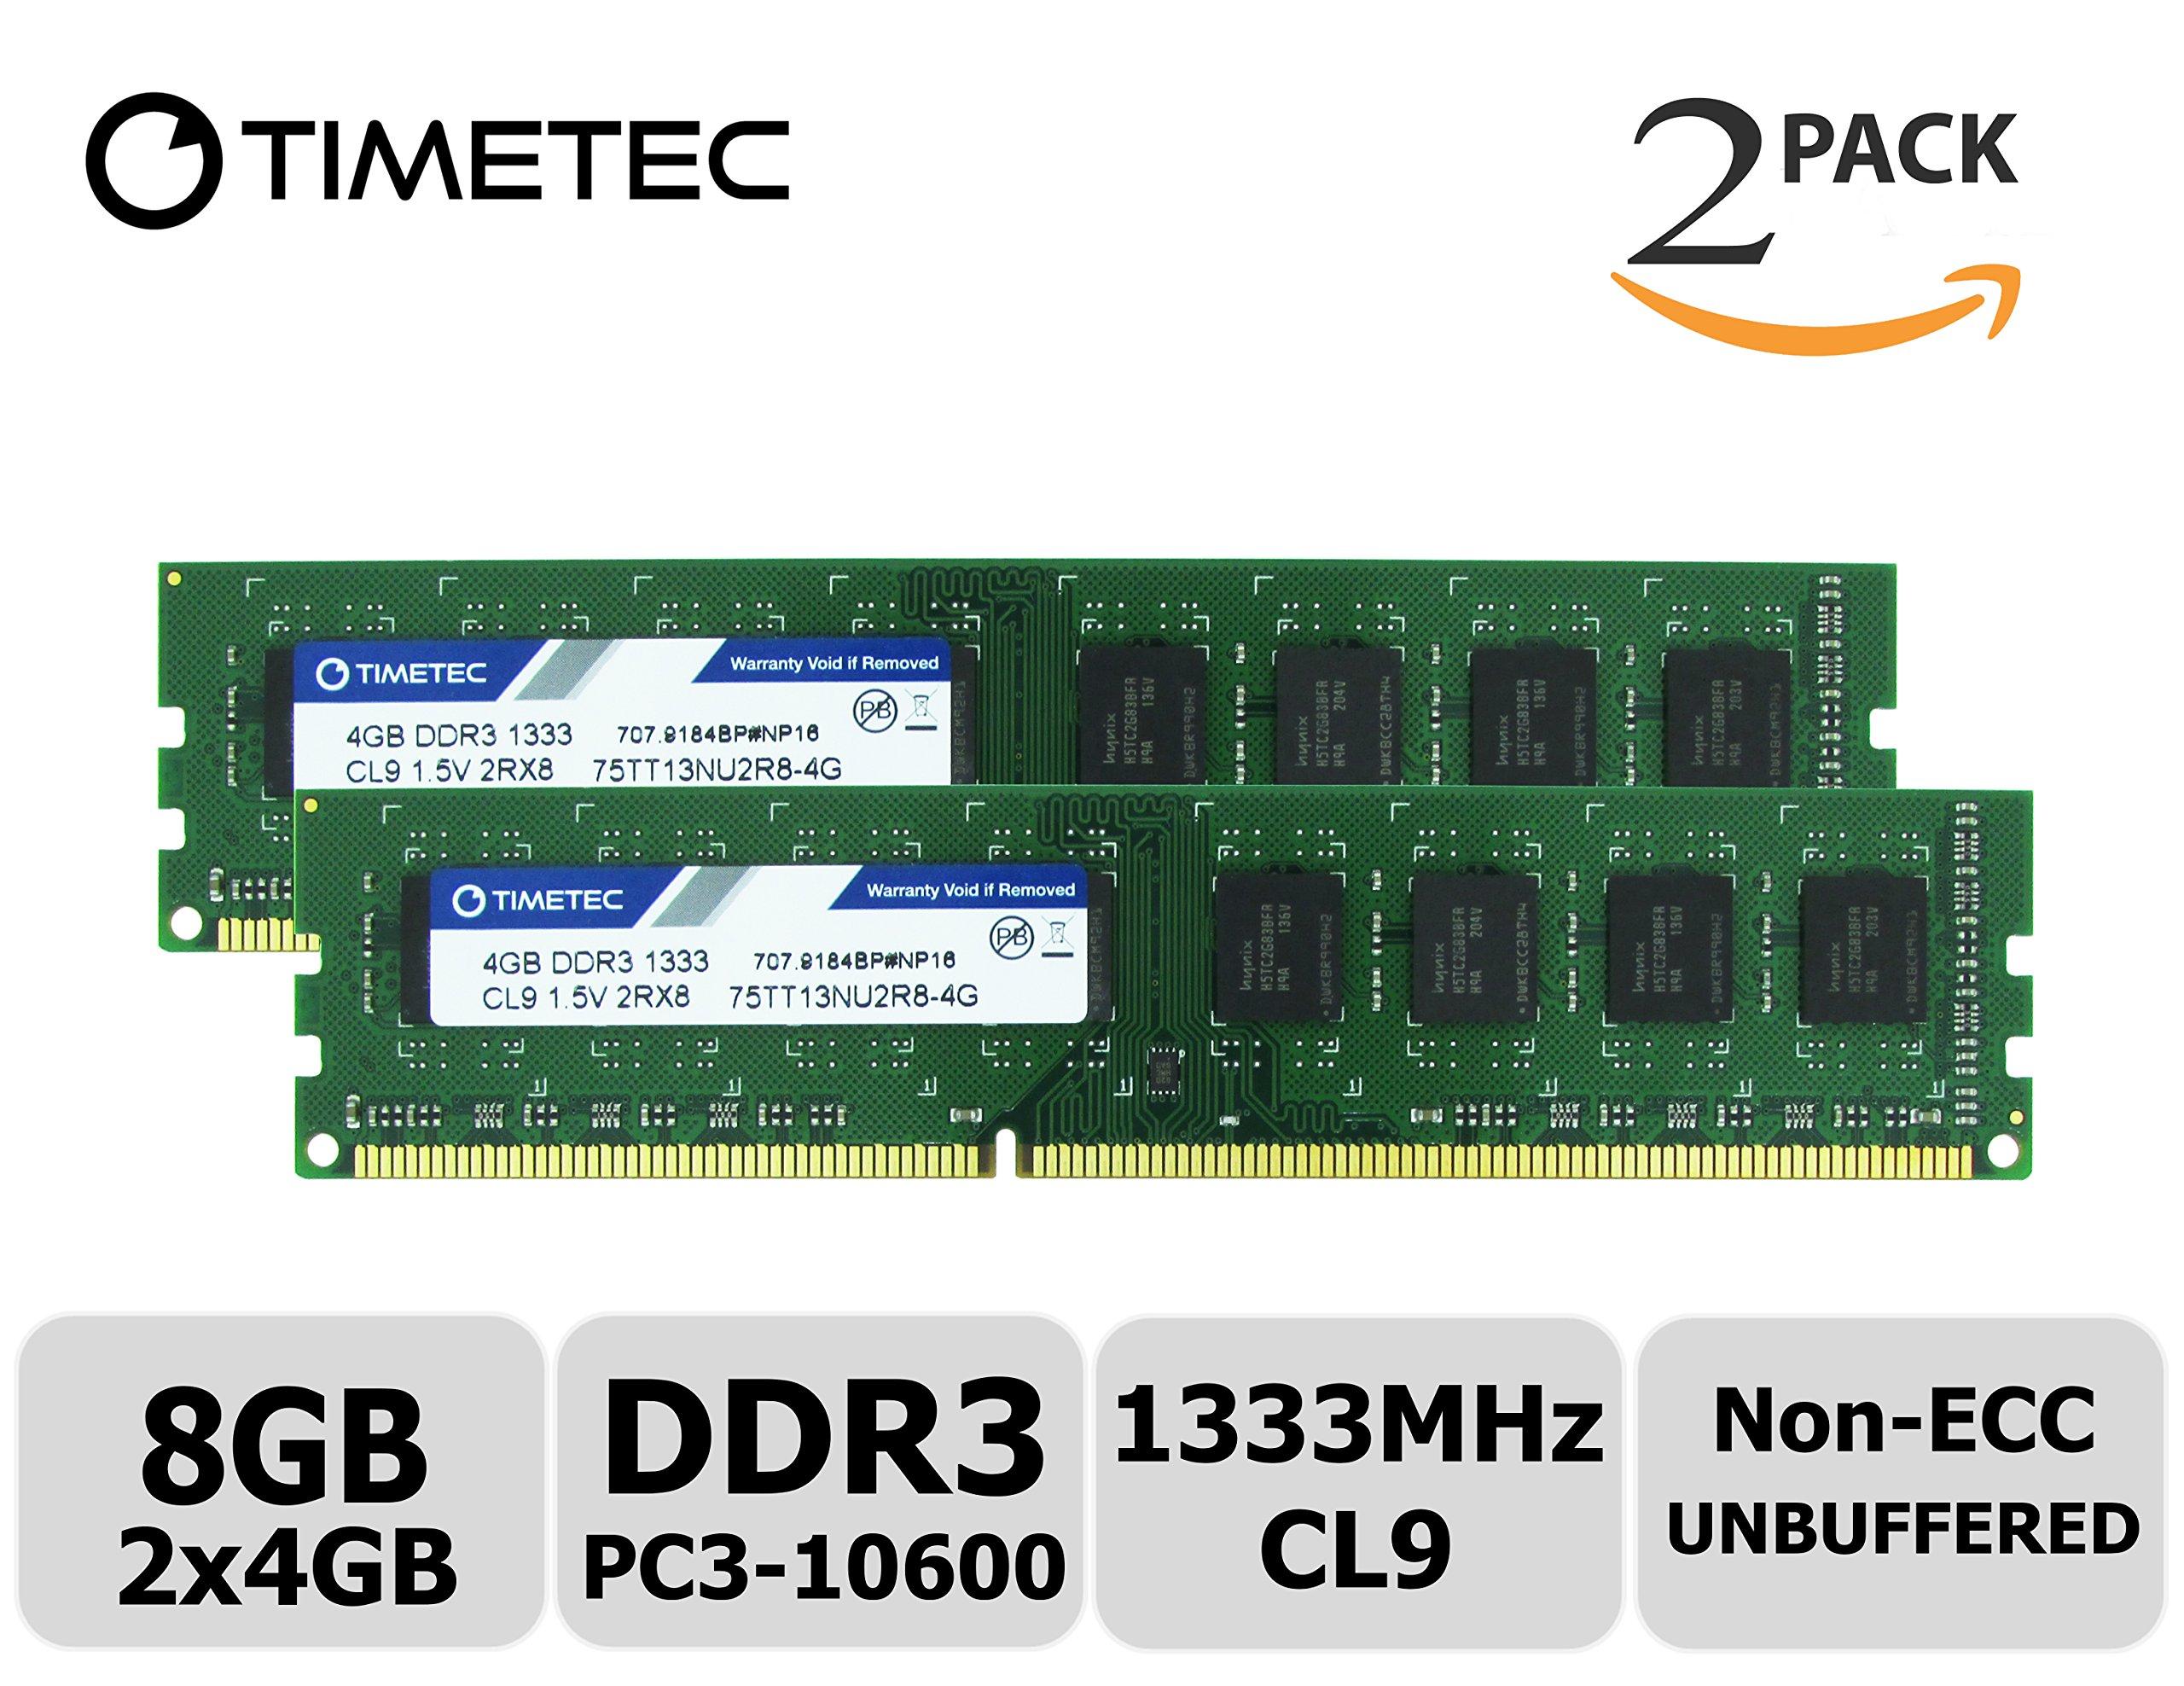 Memoria RAM 8GB Timetec Hynix IC Kit (2x4GB) DDR3 1333MHz PC3-10600 Non ECC Unbuffered 1.5V CL9 Dual Rank para Dell Opti